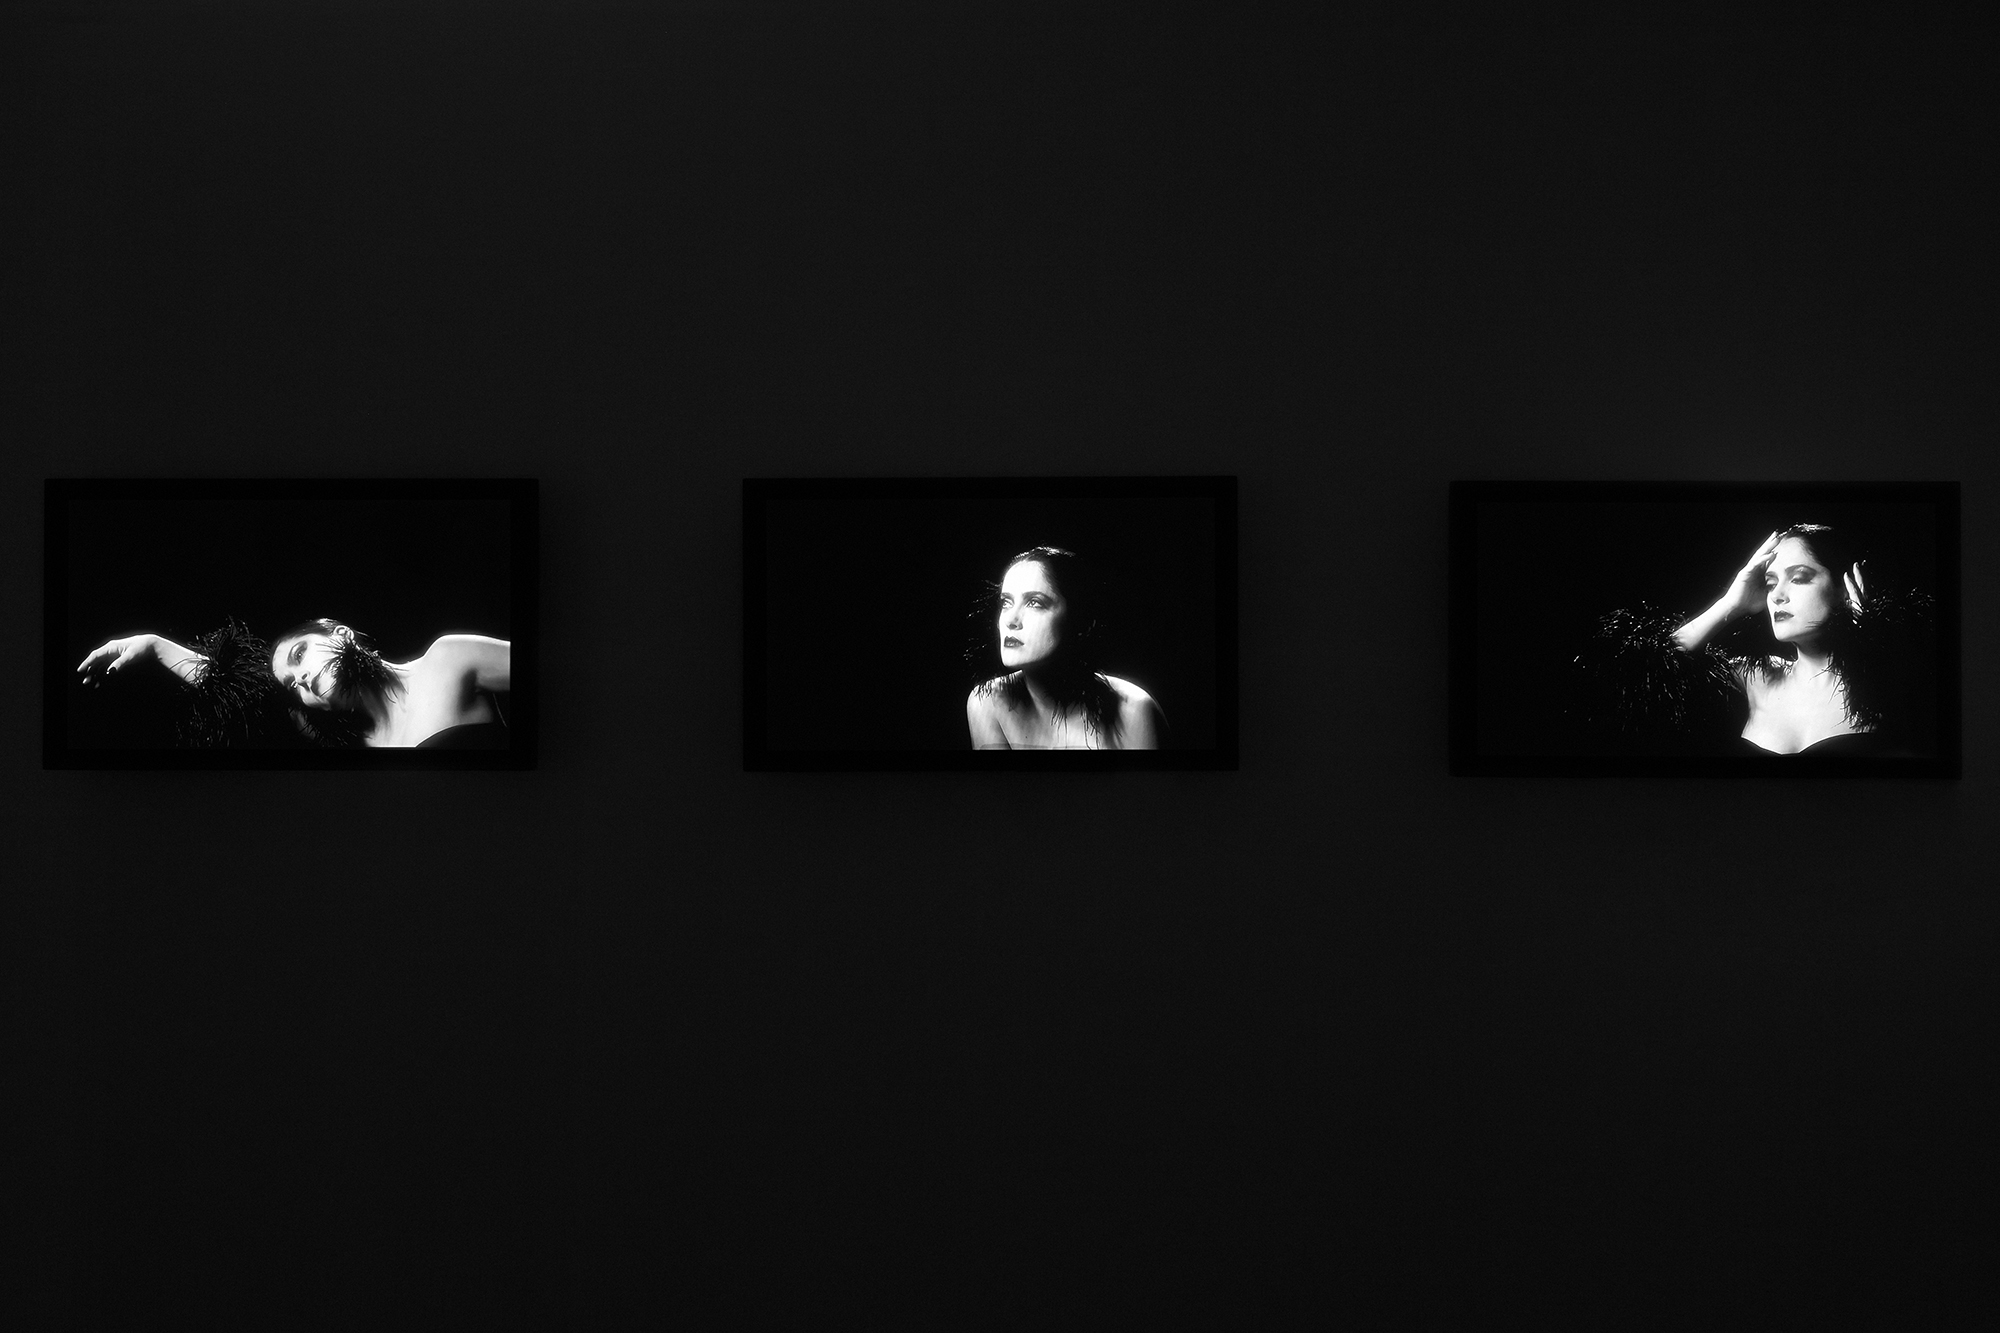 Robert_Willson_exhibition_26.jpg